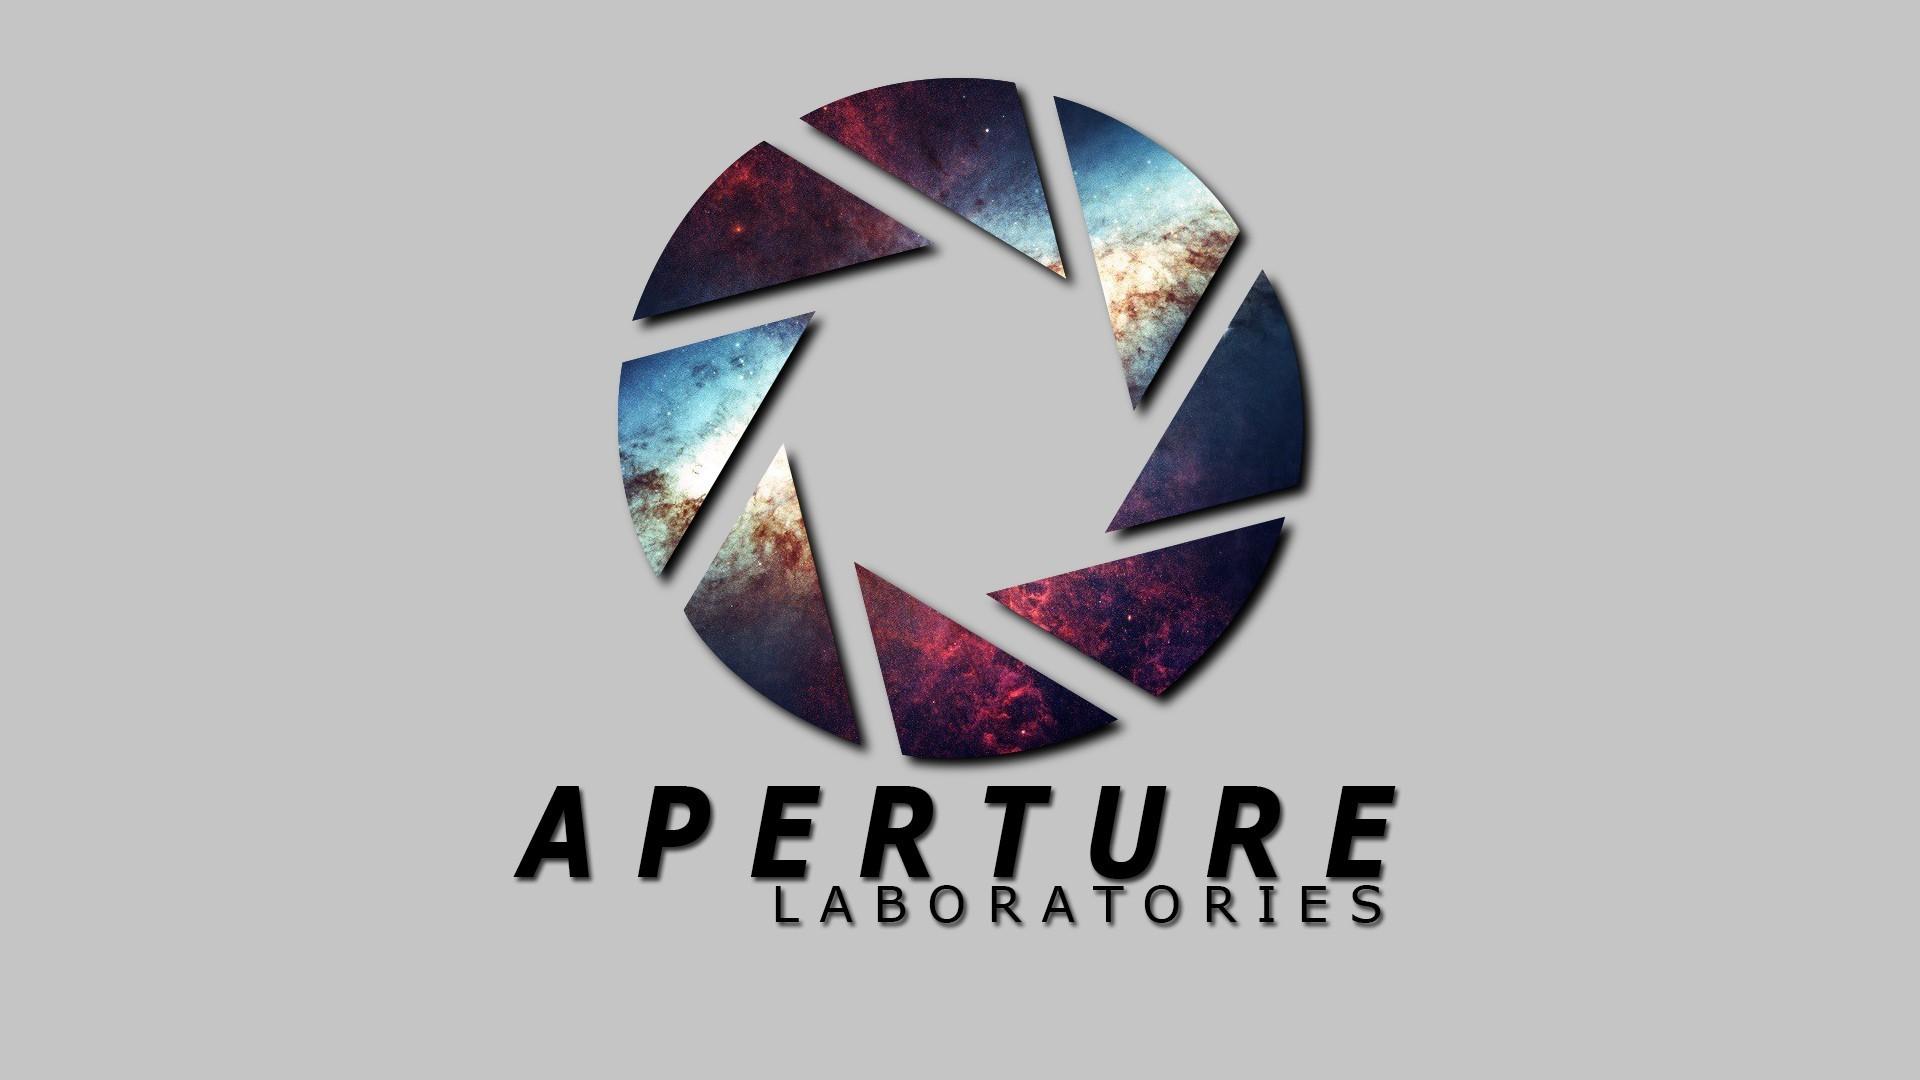 wallpaper : illustration, logo, steam software, valve, aperture